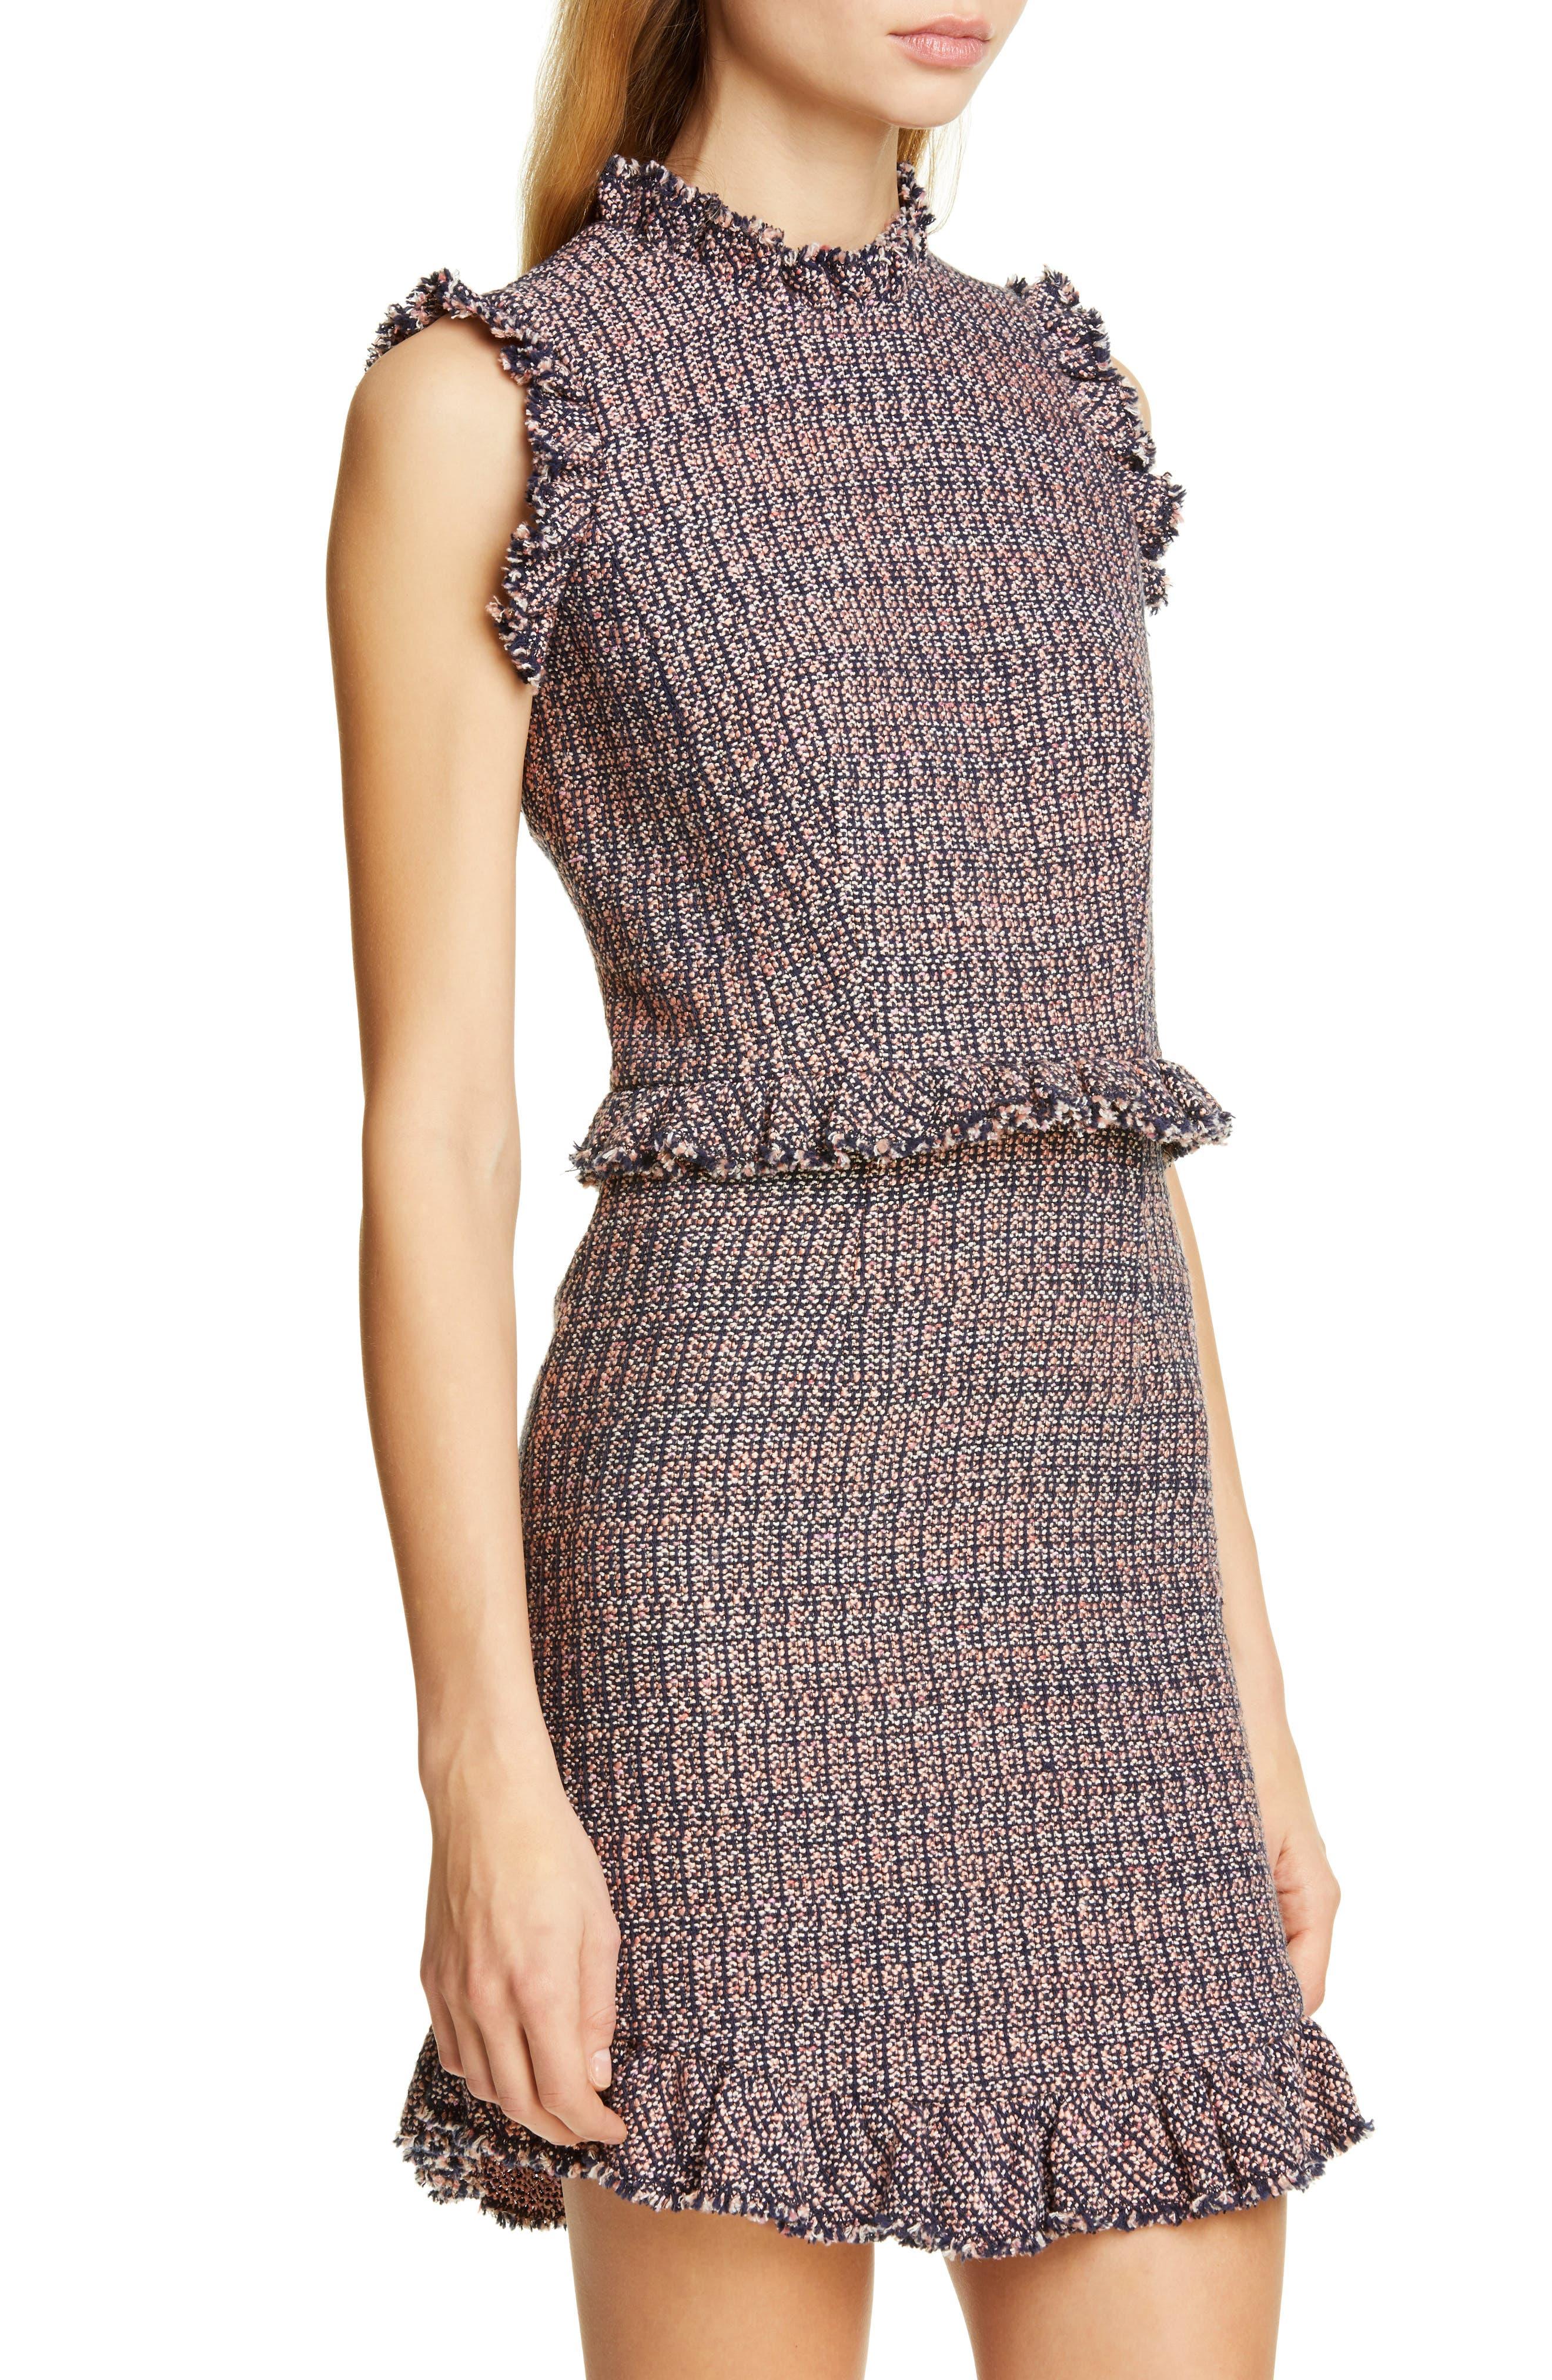 REBECCA TAYLOR, Frayed Ruffle Tweed Dress, Alternate thumbnail 5, color, PINK/ NAVY COMBO